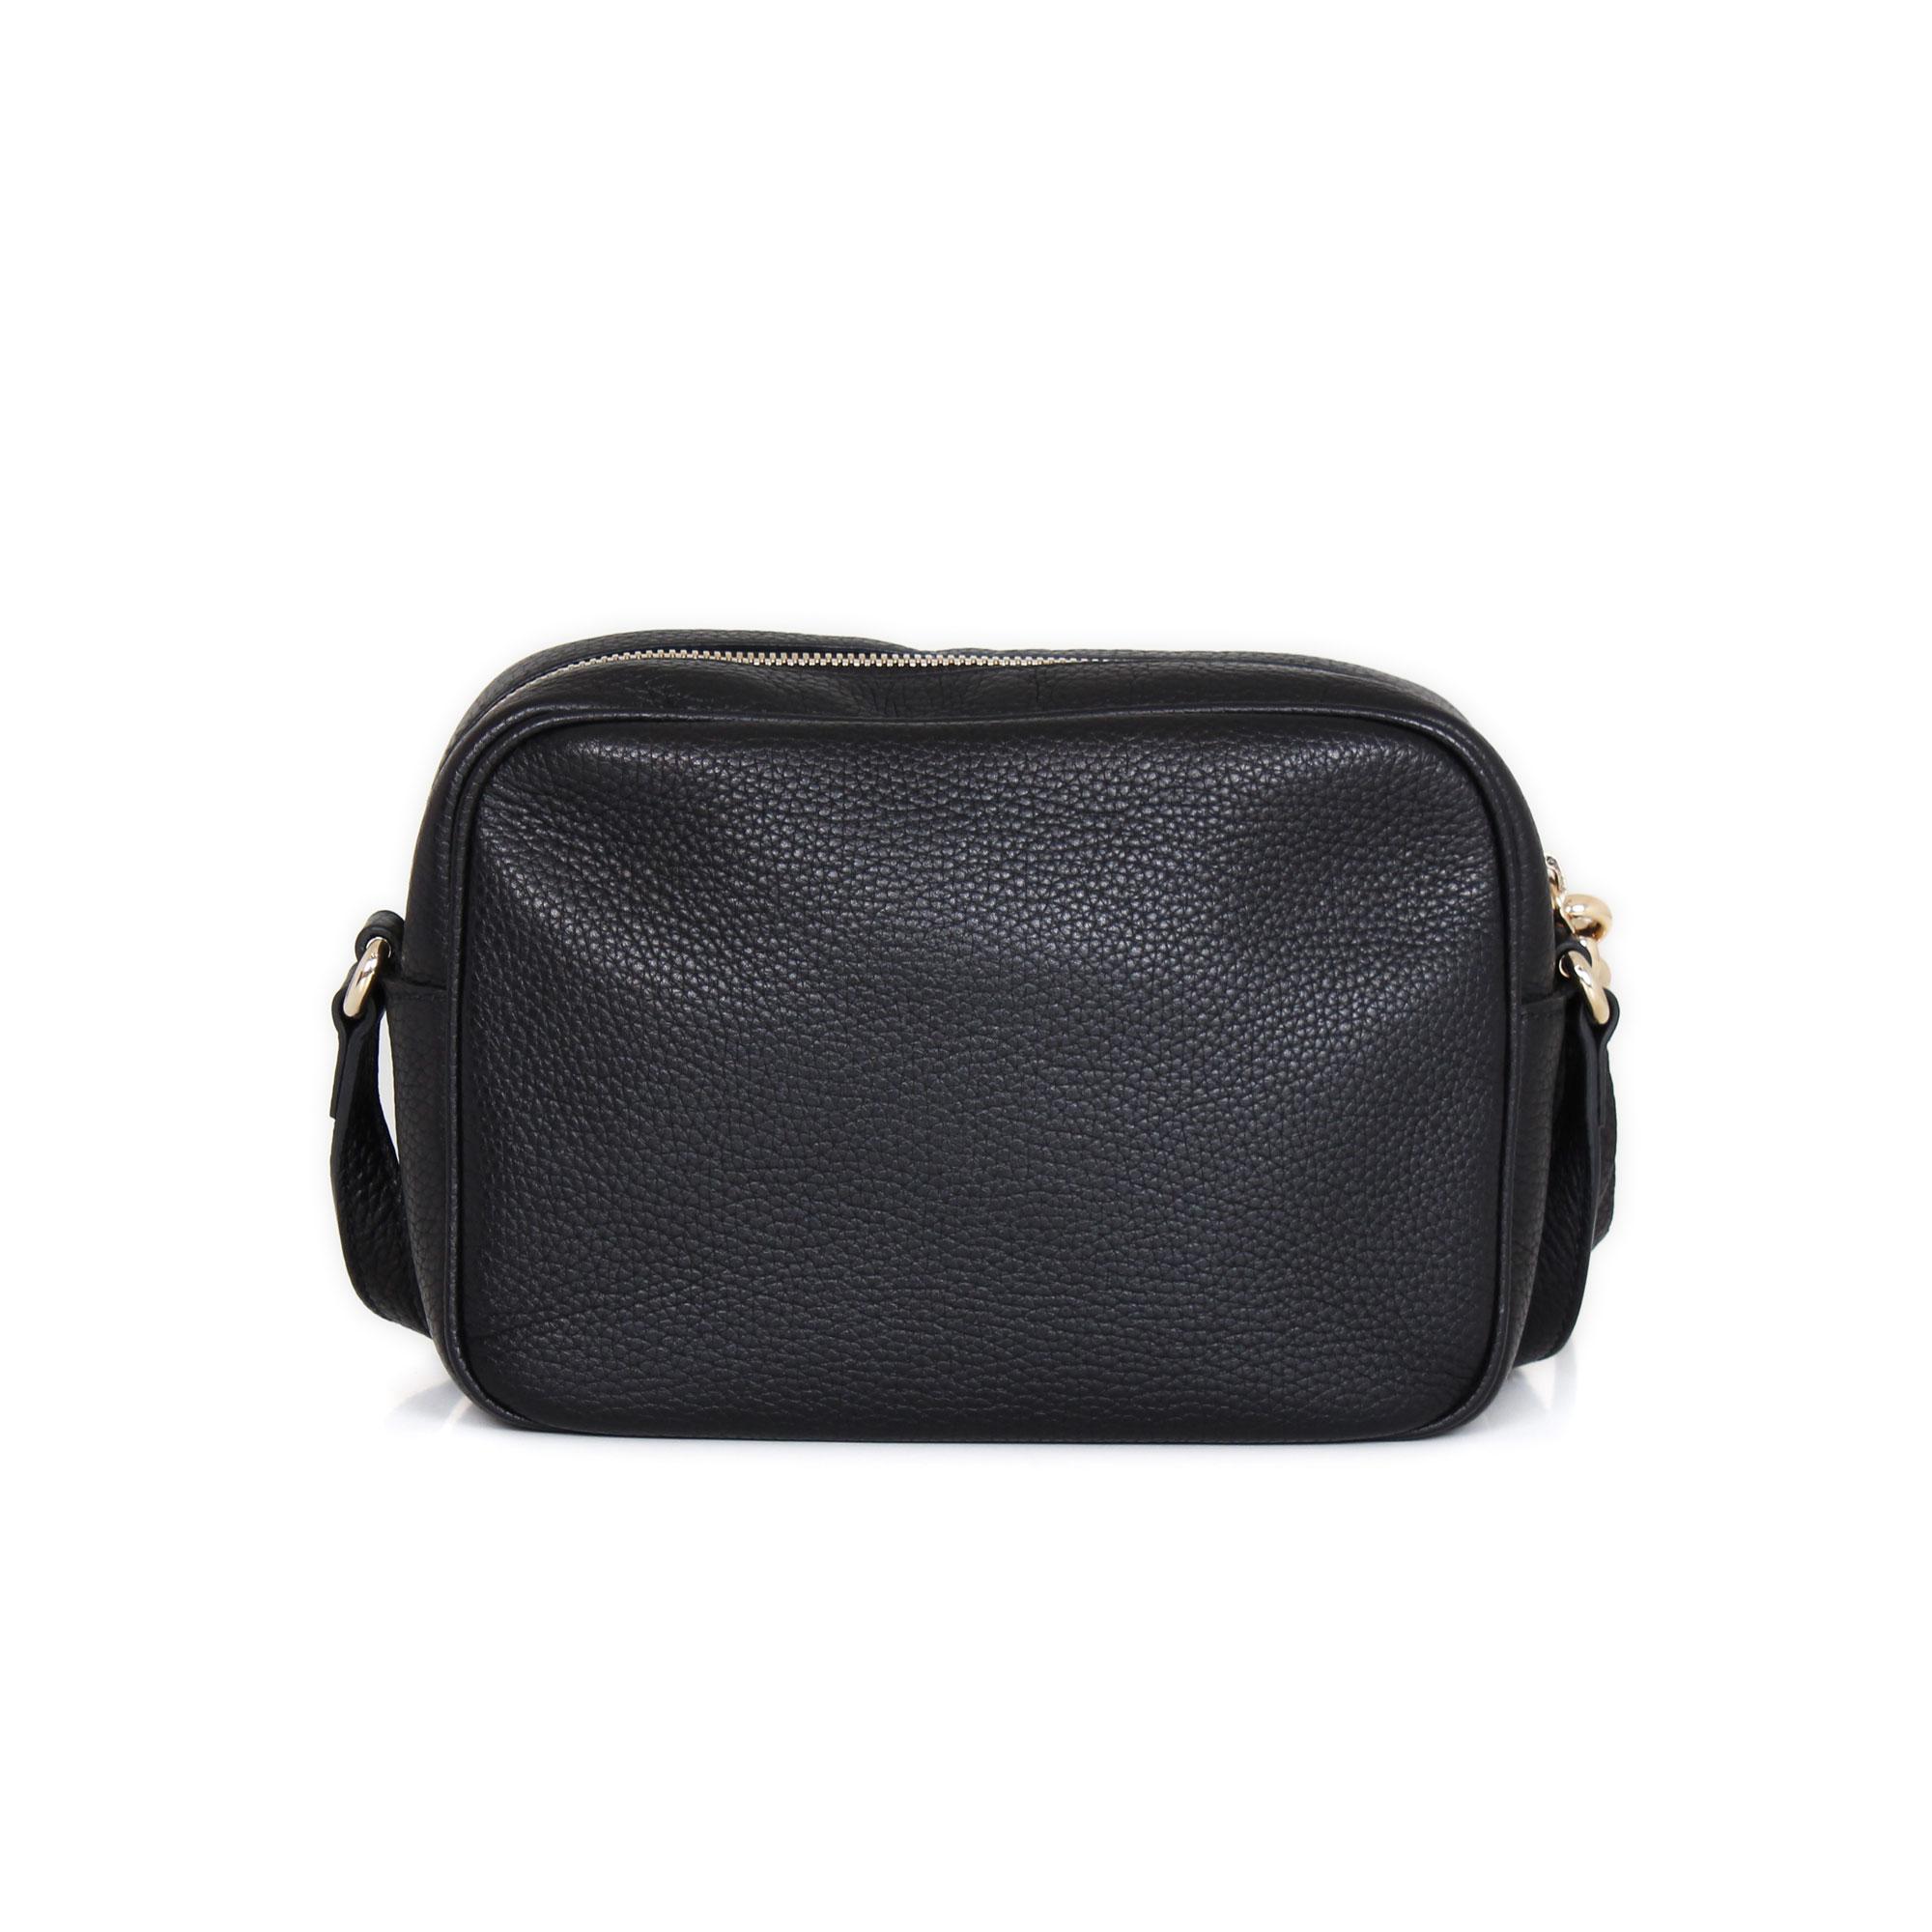 30ccbe580a506 Gucci Disco Soho Black Leather Small Handbag